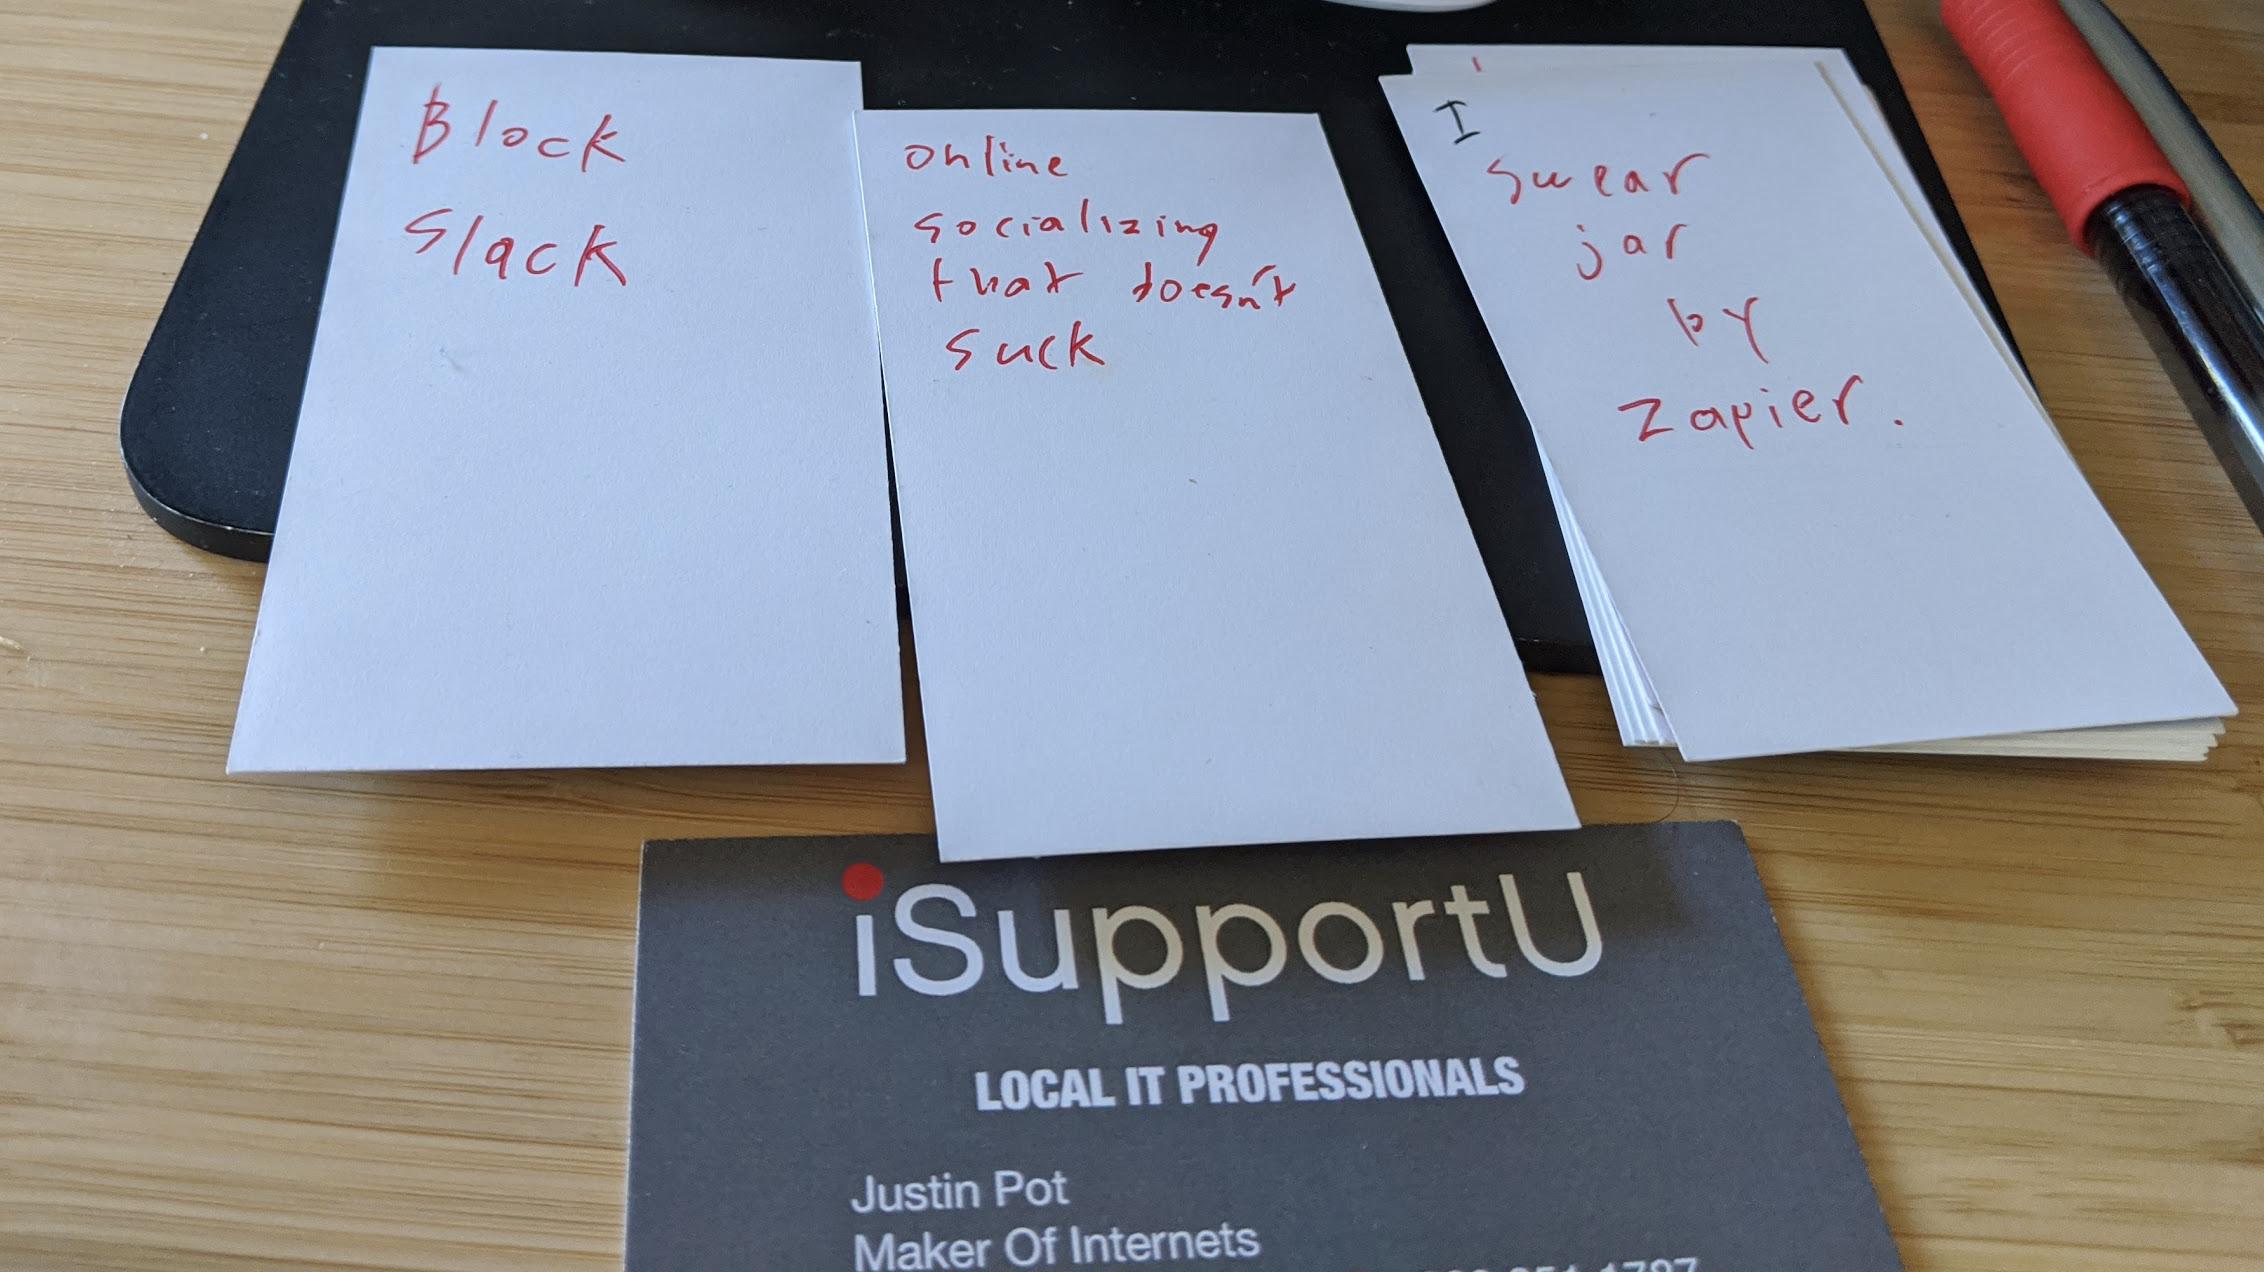 Justin's brainstorming system